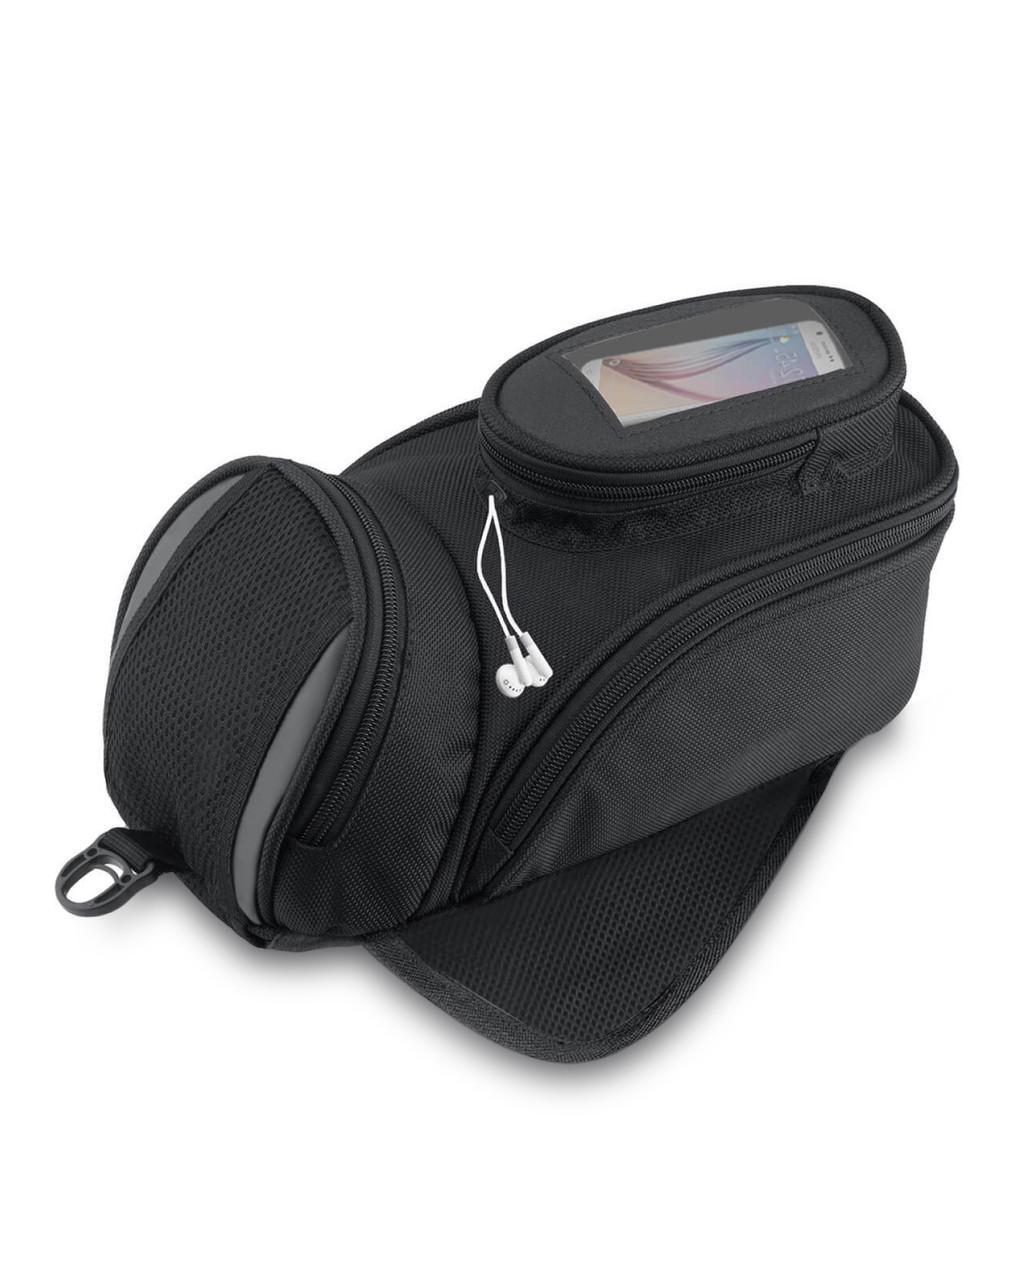 VikingBags Survival Series Magnetic Motorcycle Tank Bag For Harley Davidson Main Bag View